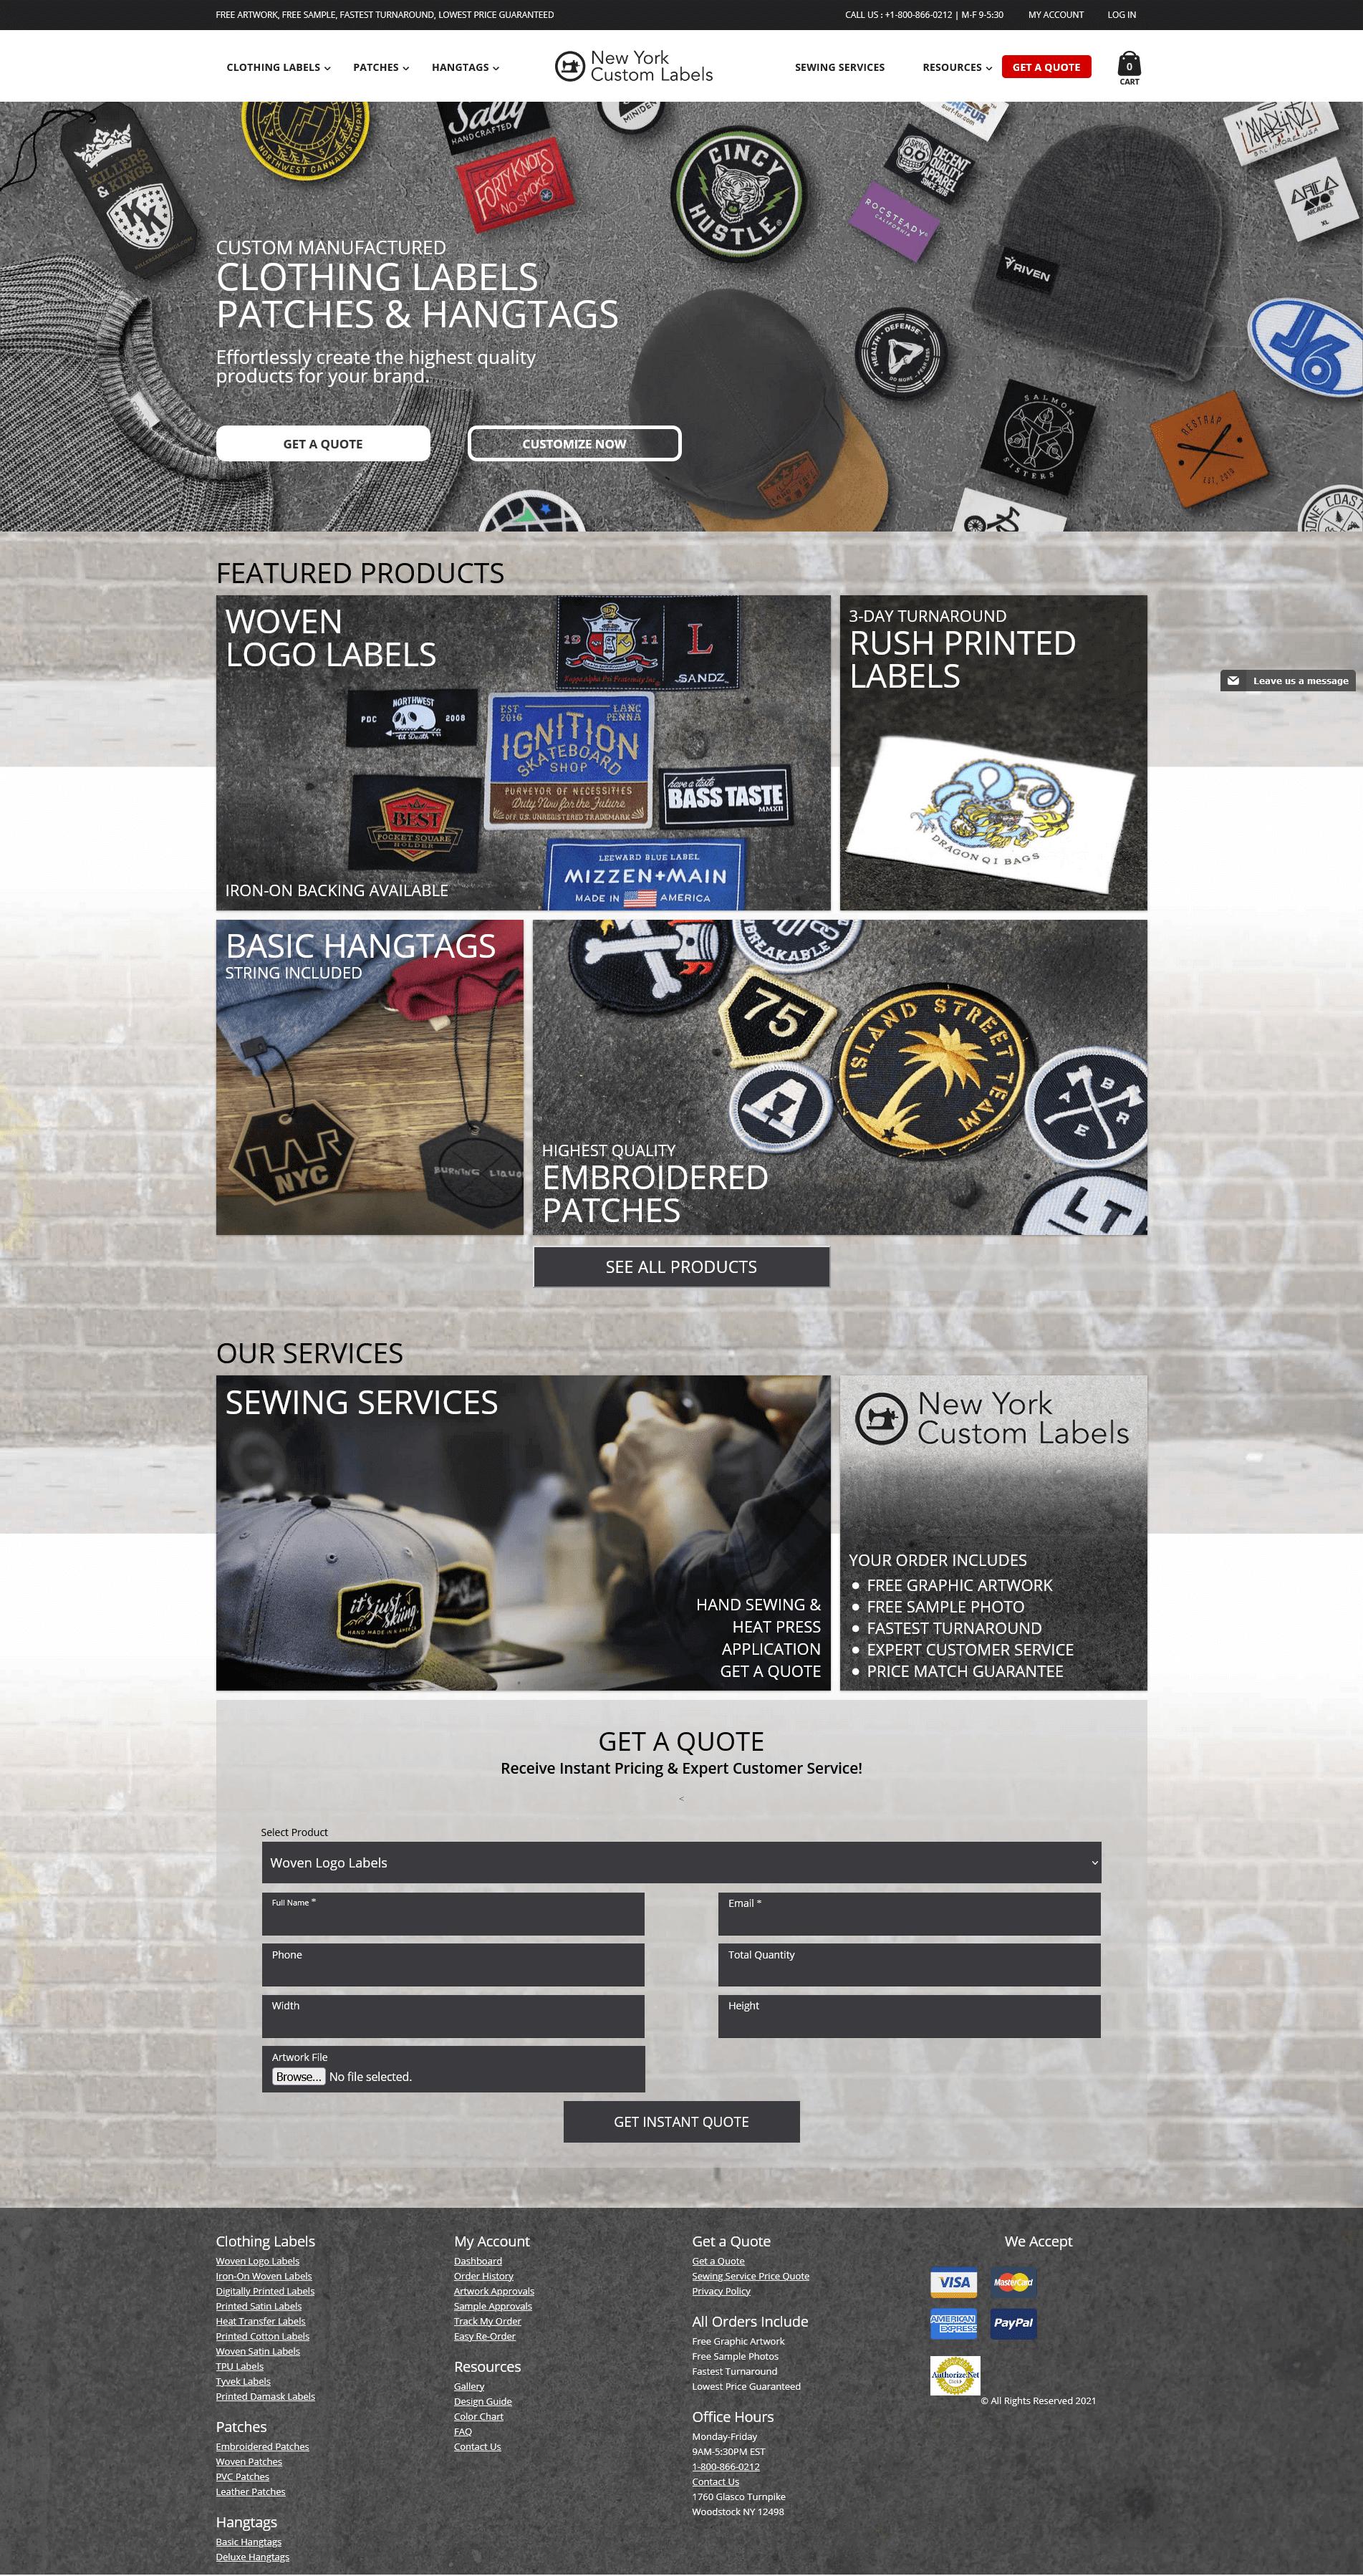 New York Custom Labels - Full Website Layout by Ok Omni